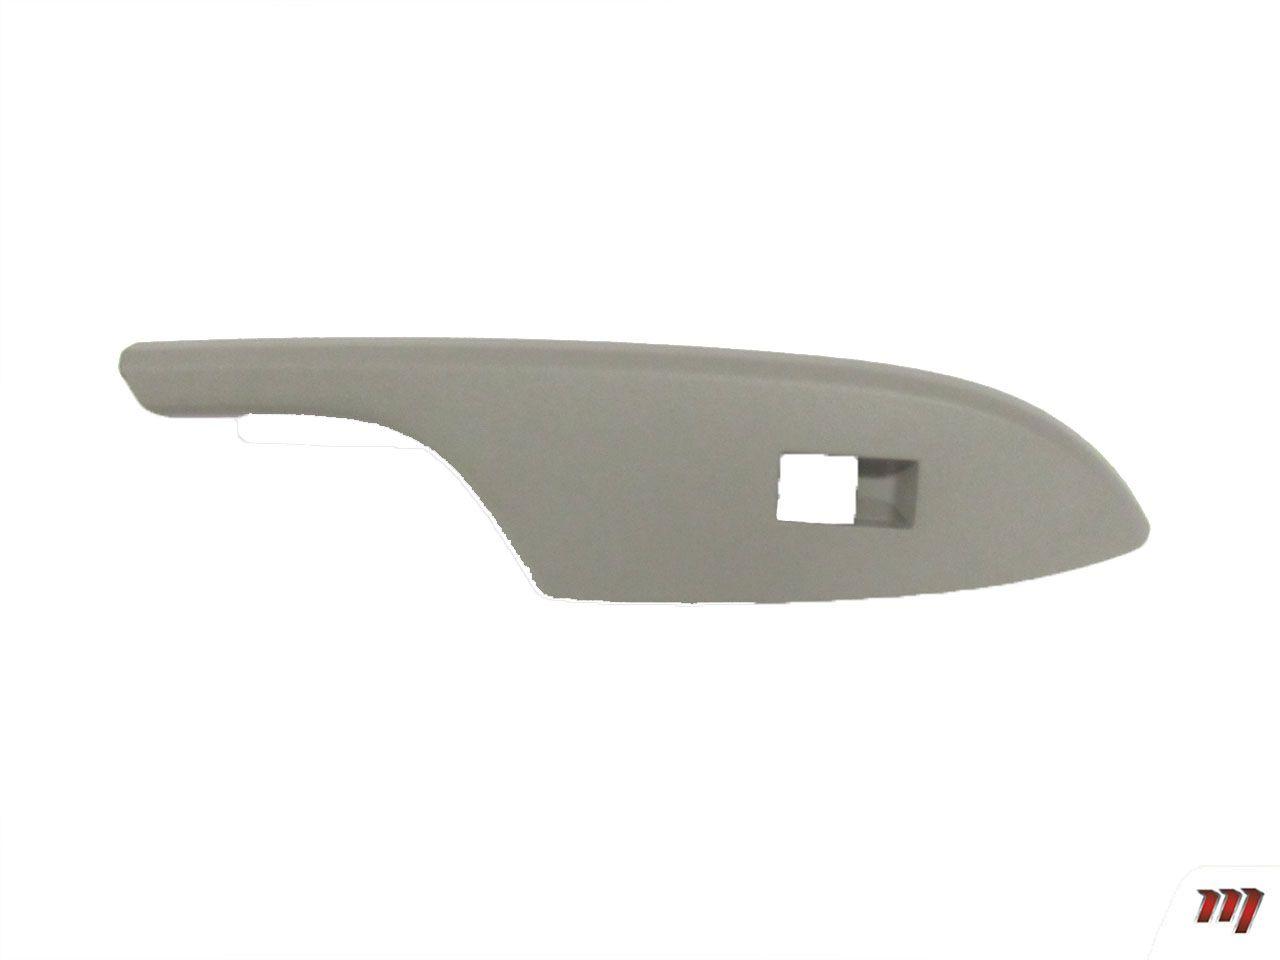 Interruptor Vidros Descansa Braço Superior Direito Corolla 2008 a 2014  - Mirai Peças Toyota